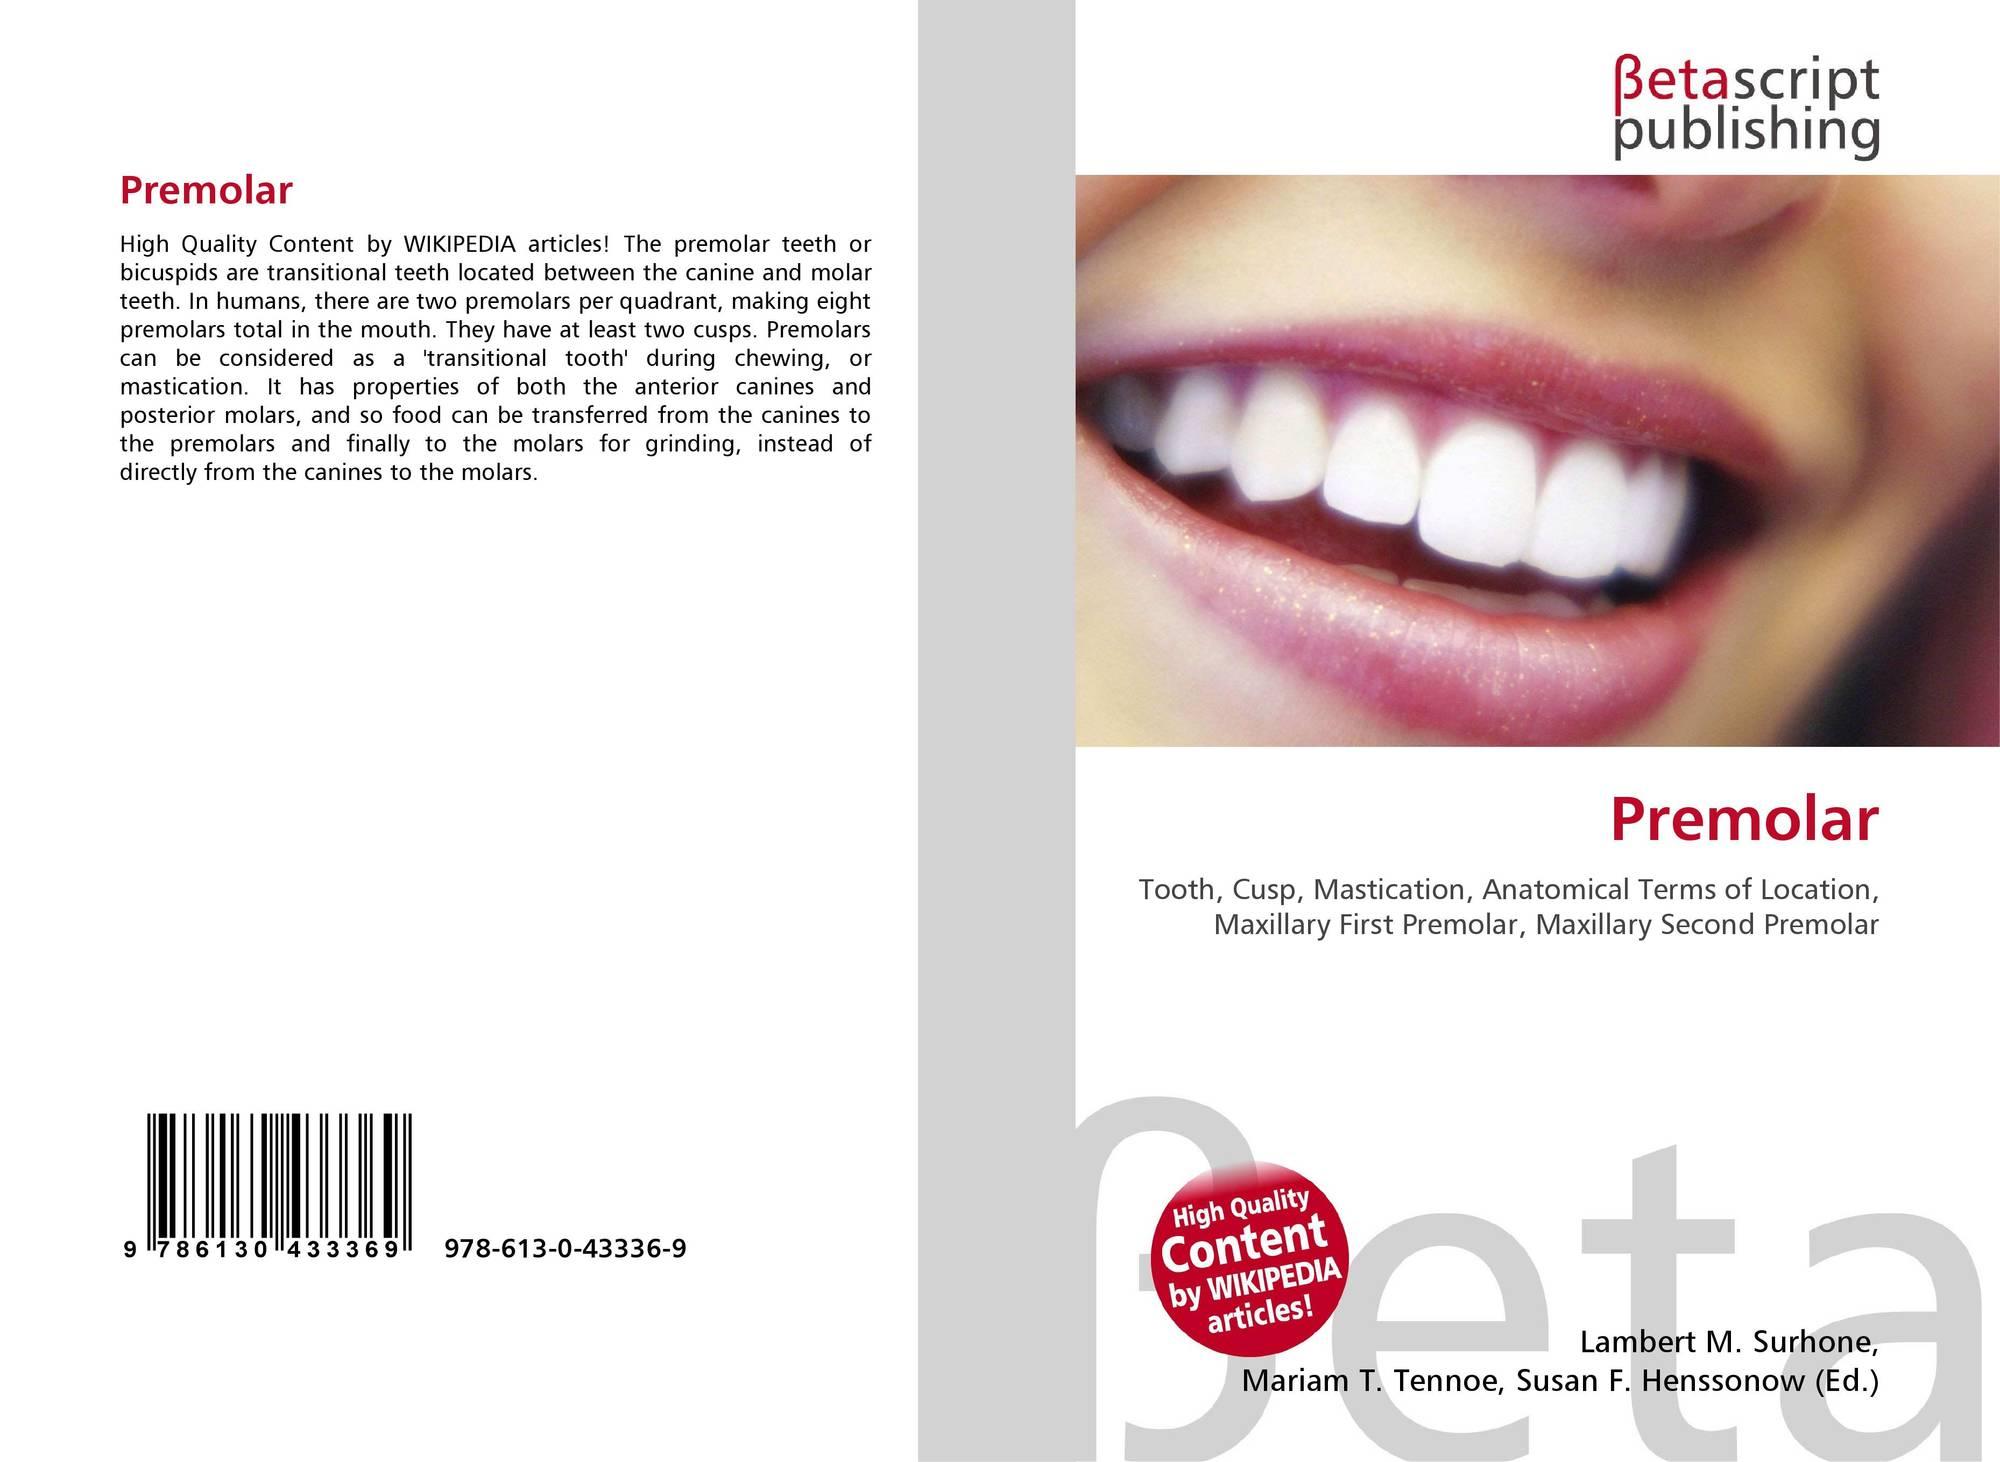 Premolar, 978-613-0-43336-9, 6130433360 ,9786130433369